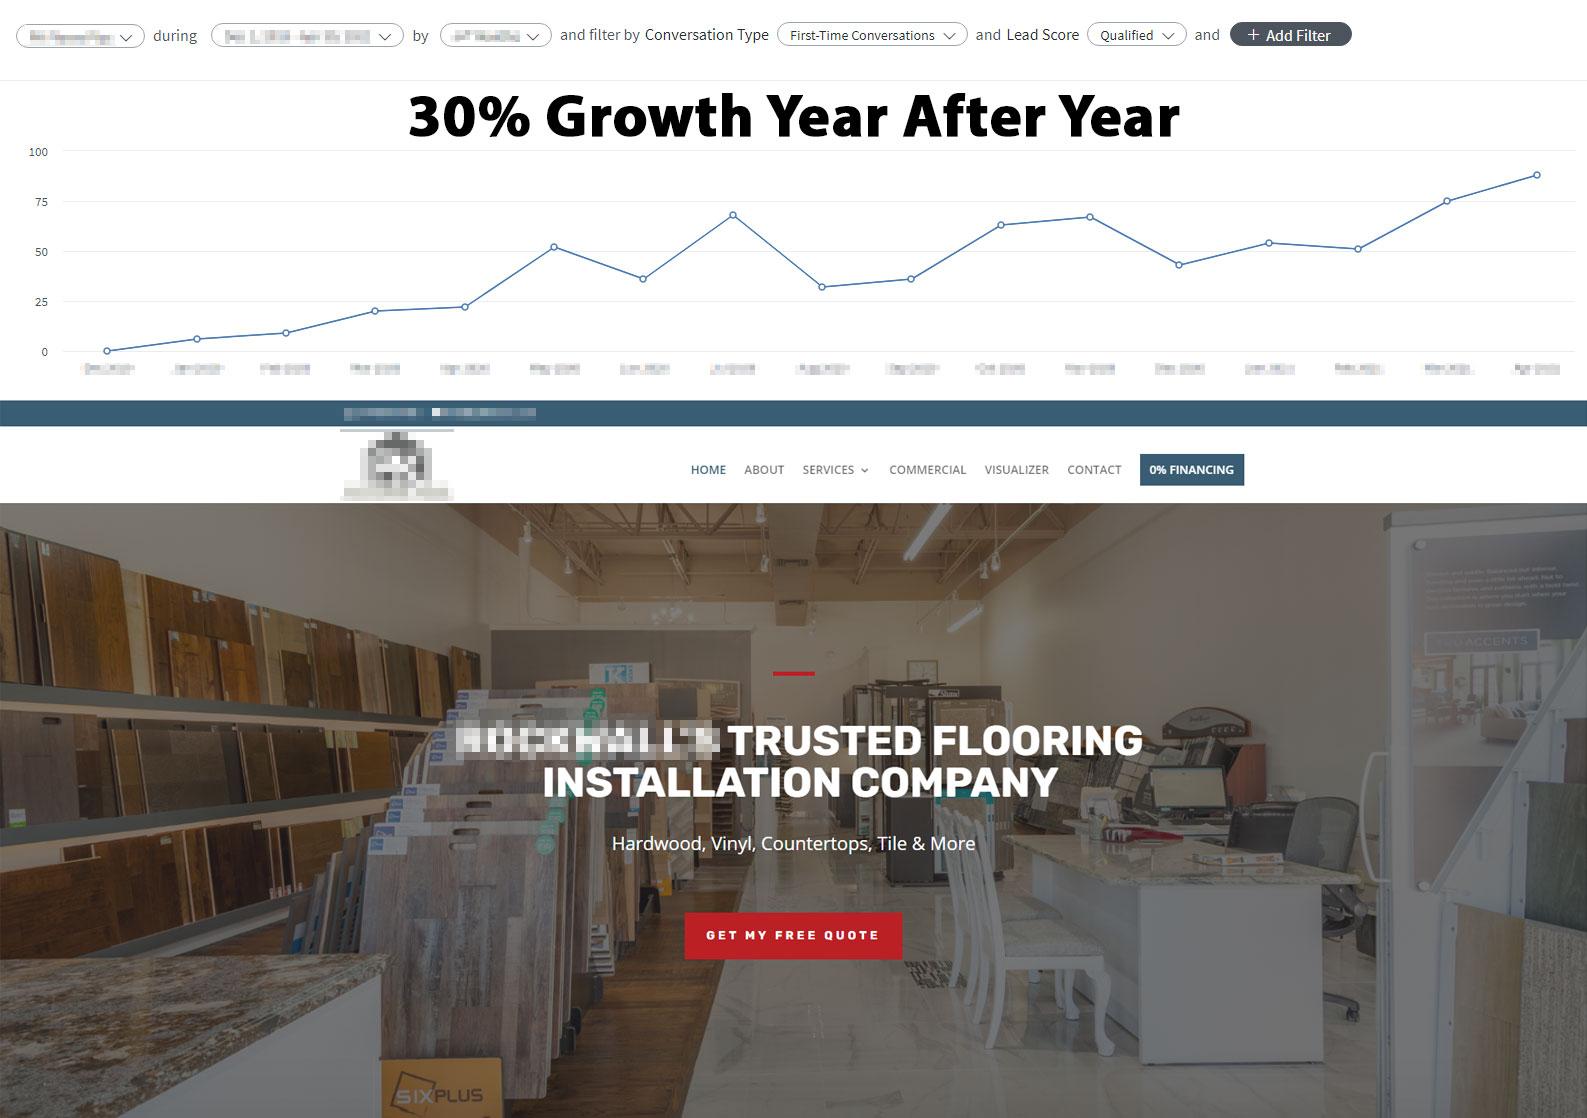 online marketing tile flooring installation remodeling contractor digital marketing services best companies near me innovative marketing 2